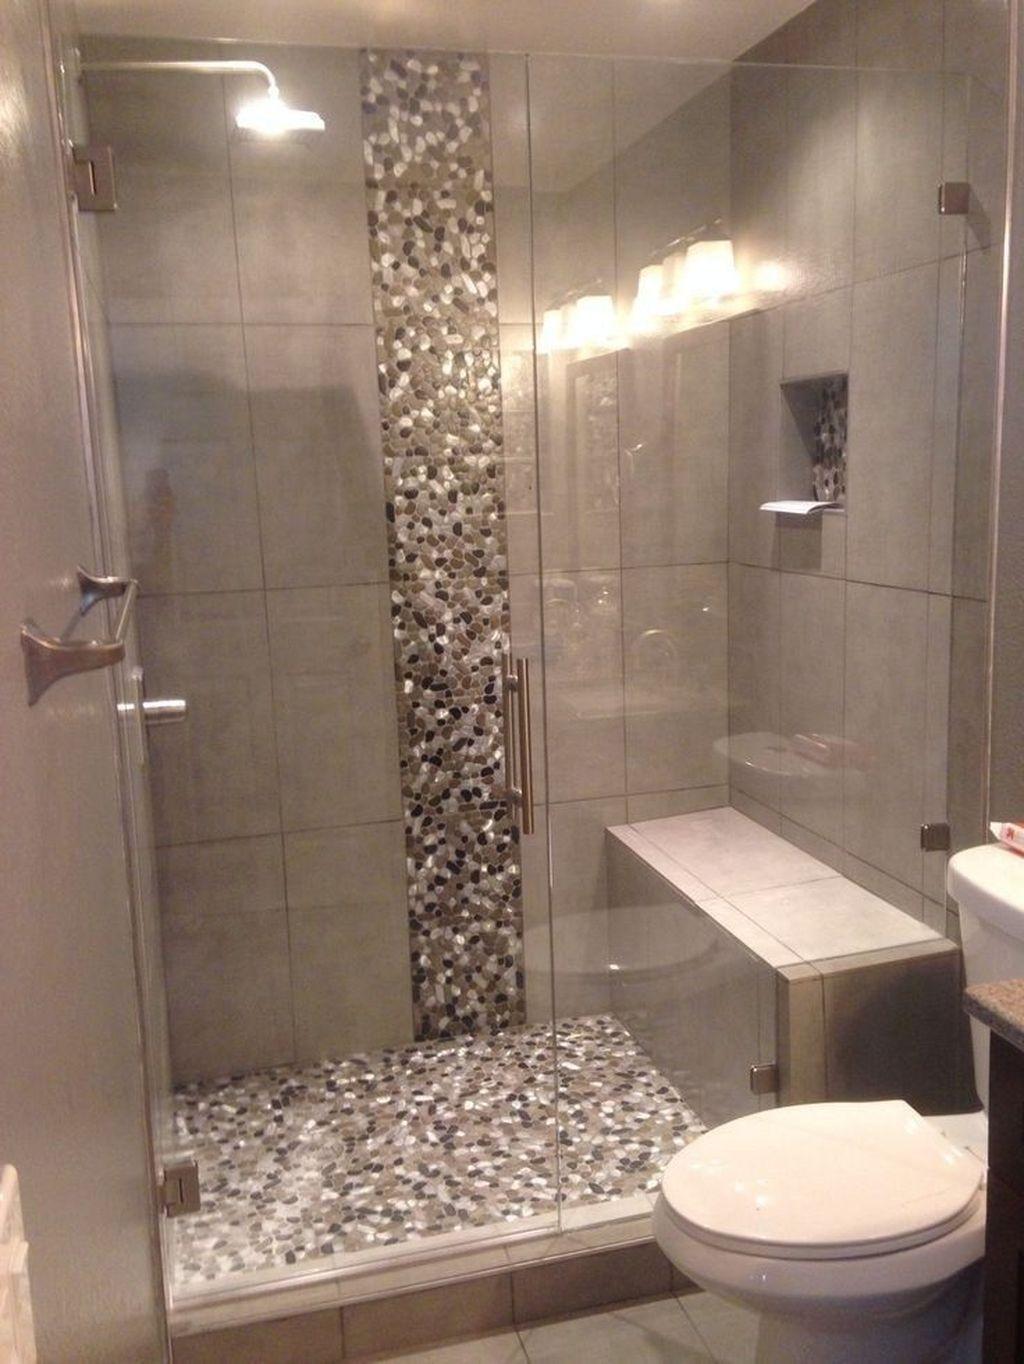 36 Amazing Small Bathroom Design Ideas In 2020 Bathroom Remodel Shower Shower Remodel Bathroom Remodel Master